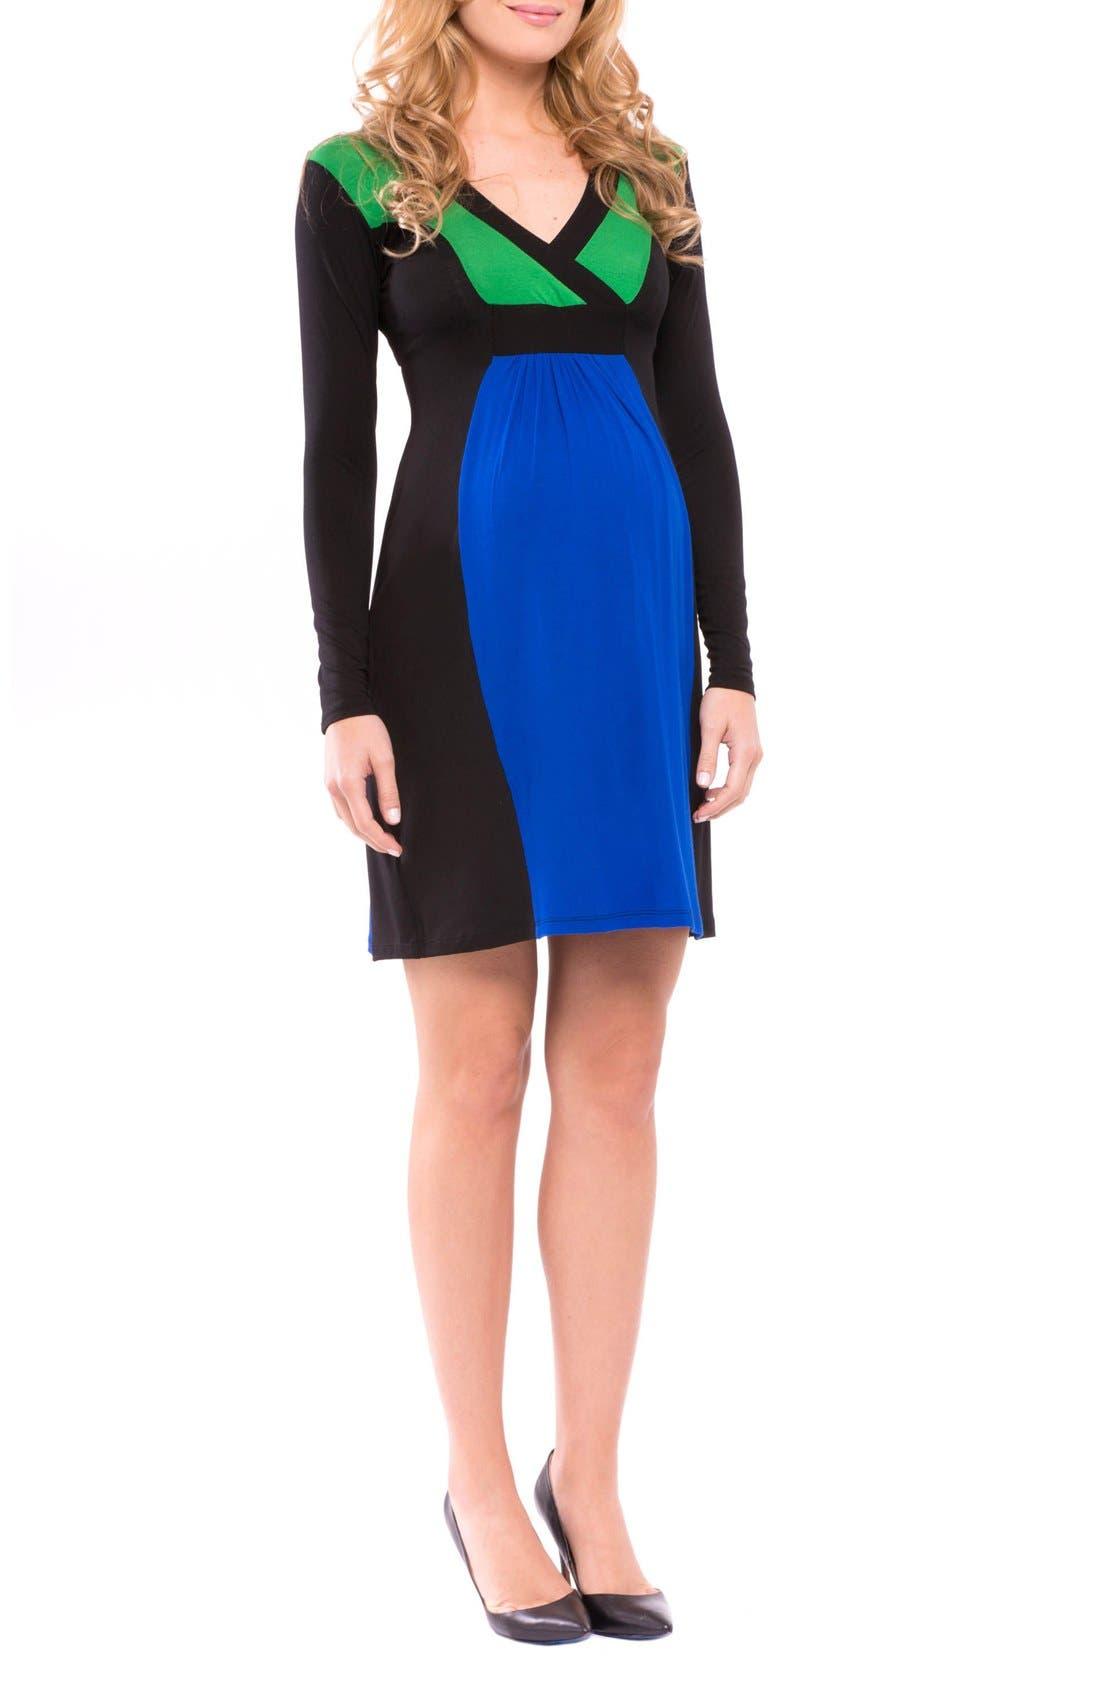 Margaret Maternity Dress,                             Alternate thumbnail 3, color,                             True Blue/ Grey/ Black